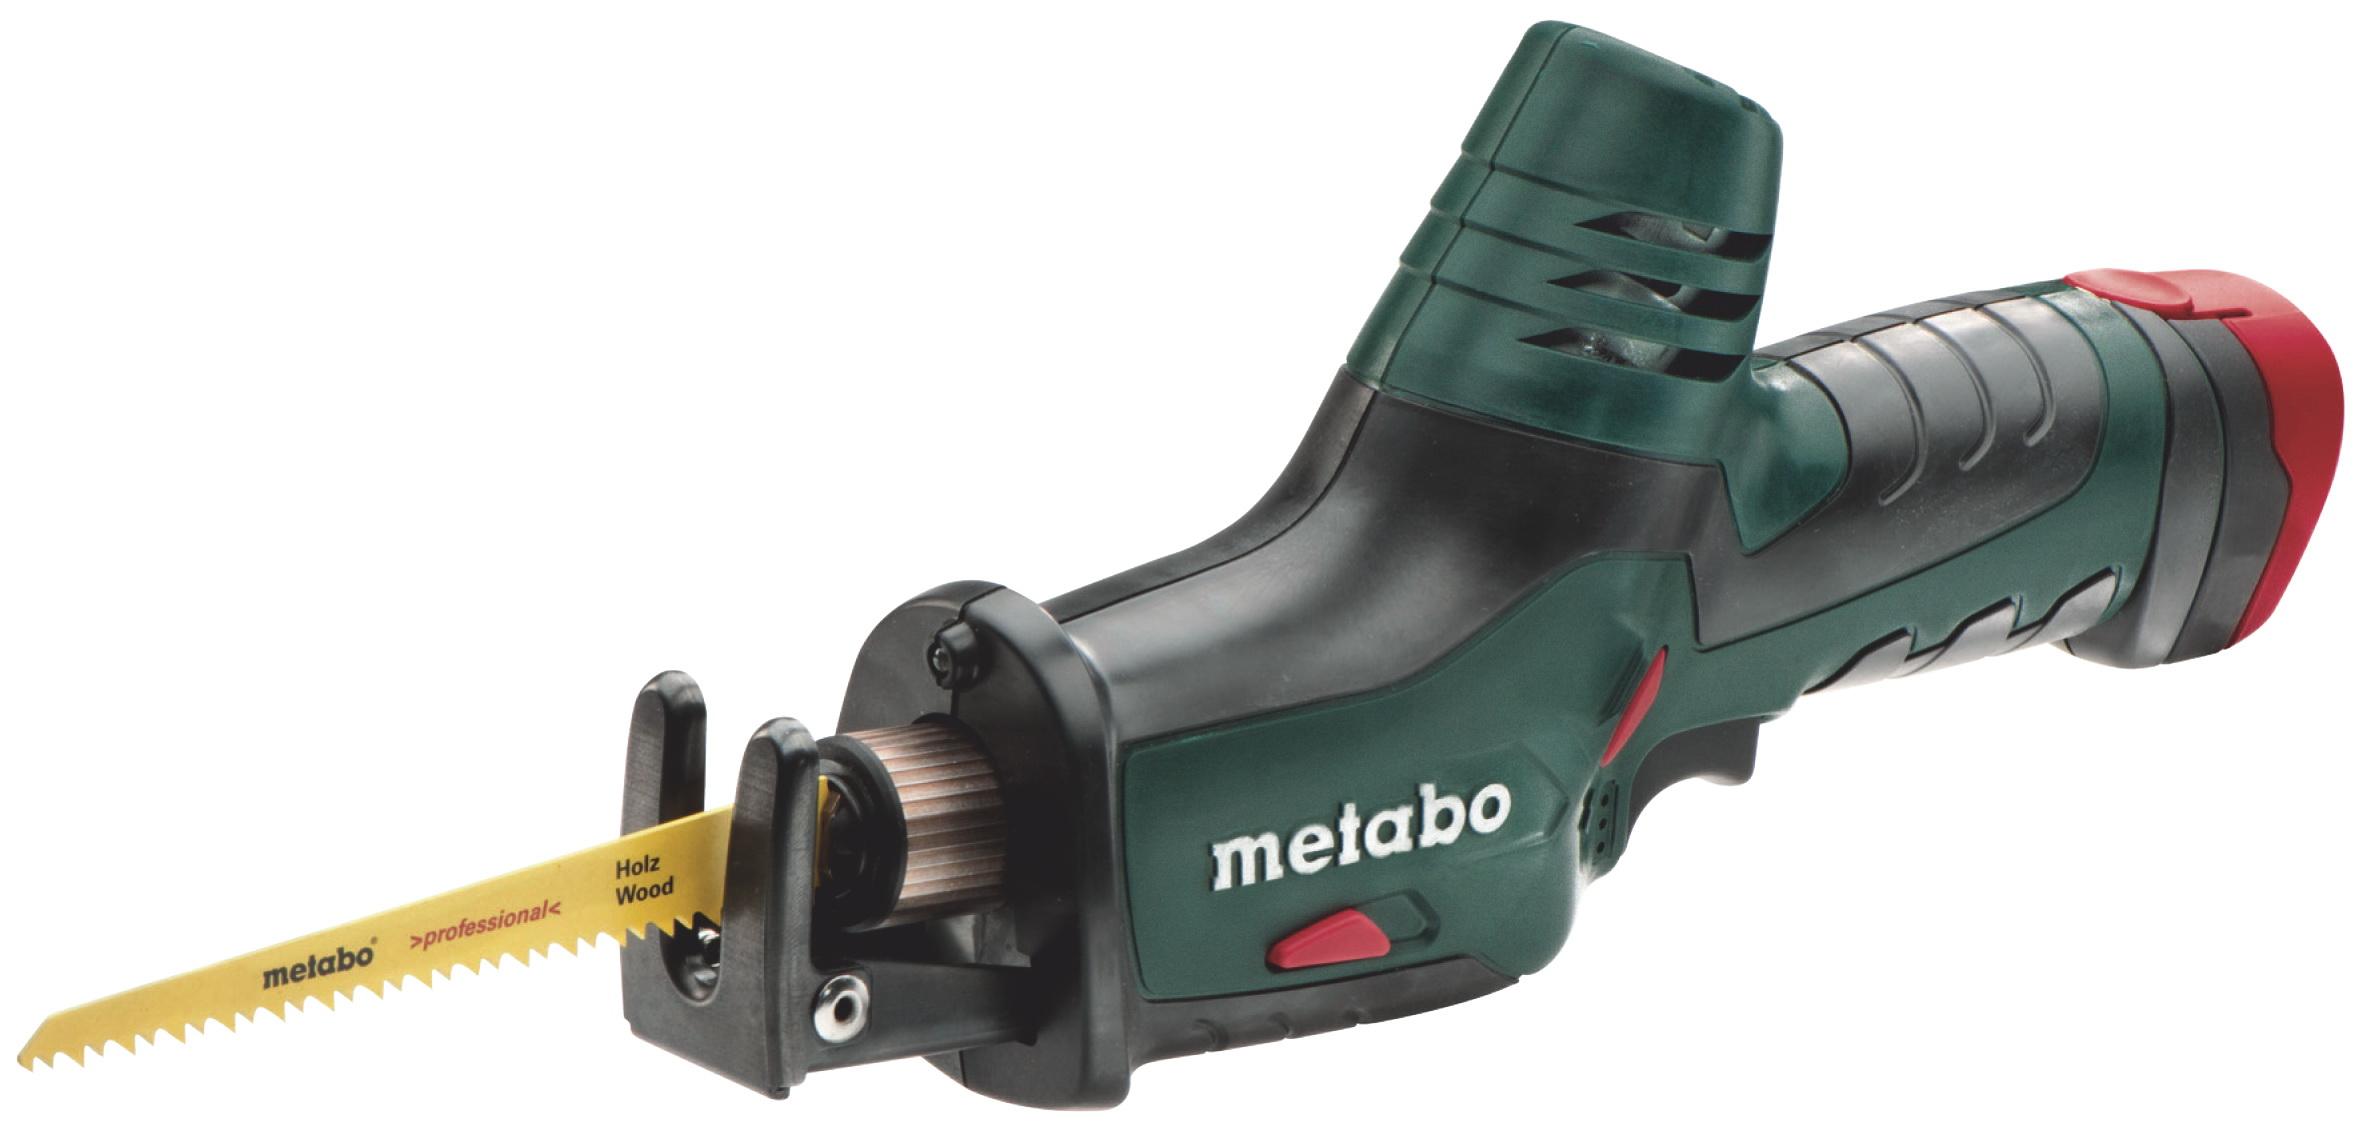 Аккумуляторная ножовка Metabo Powermaxx ase (602264500)